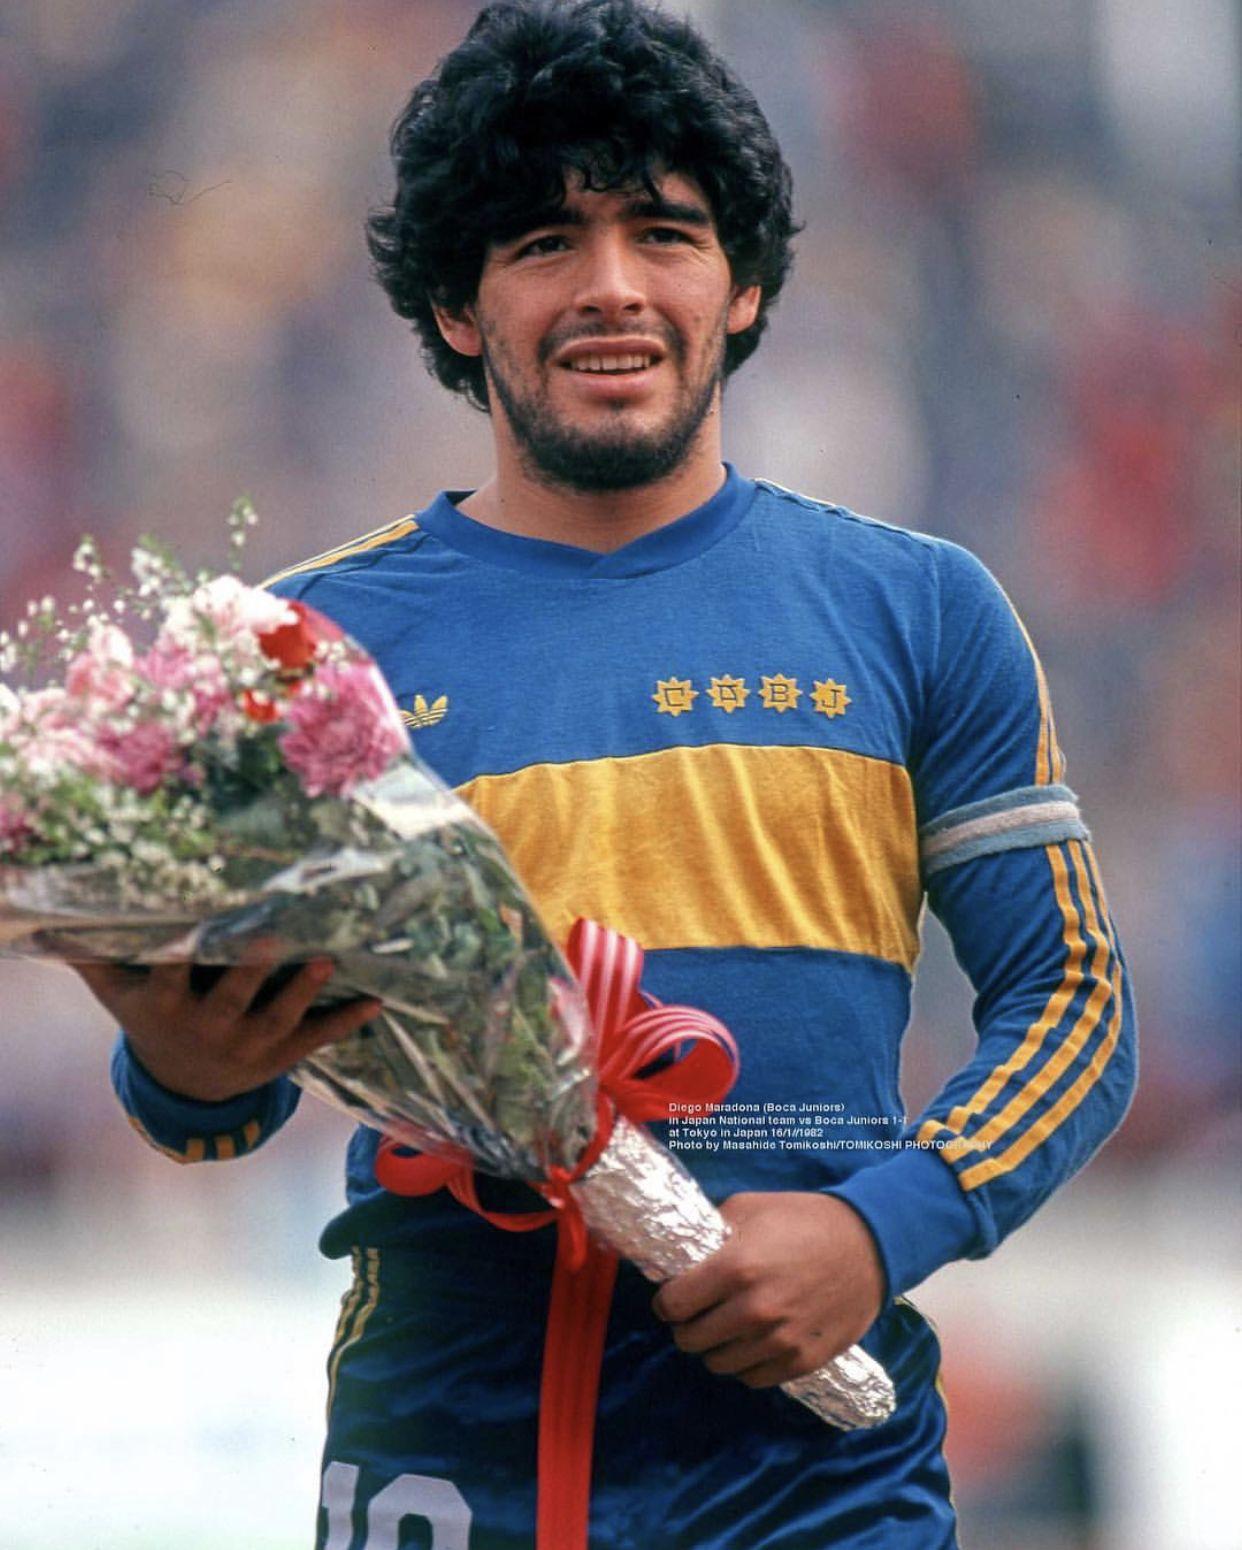 Pin de Carlos Vázquez en Boca Jrs Diego maradona, Fotos